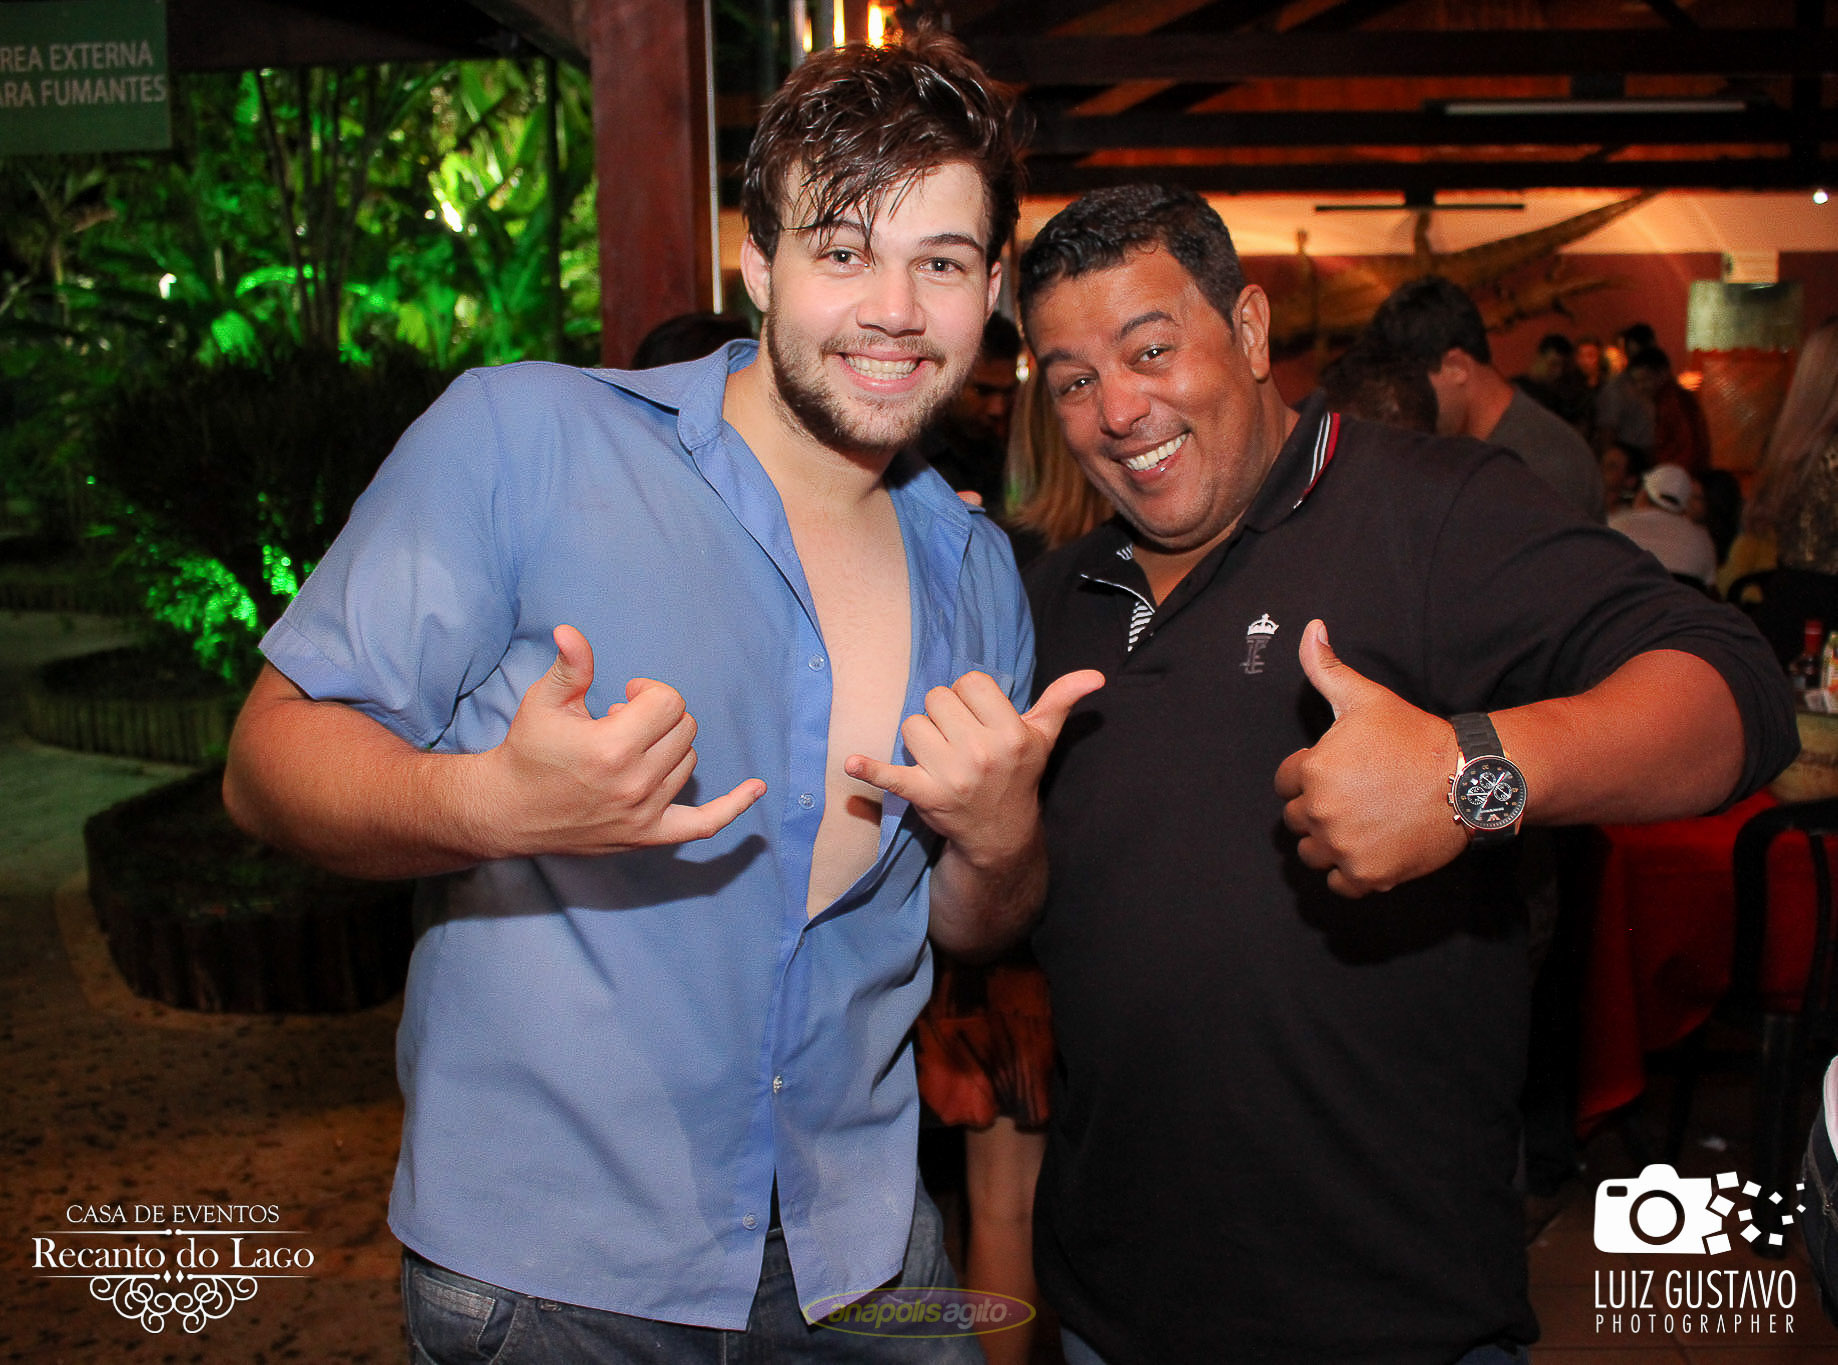 Luiz Gustavo Photographer-45